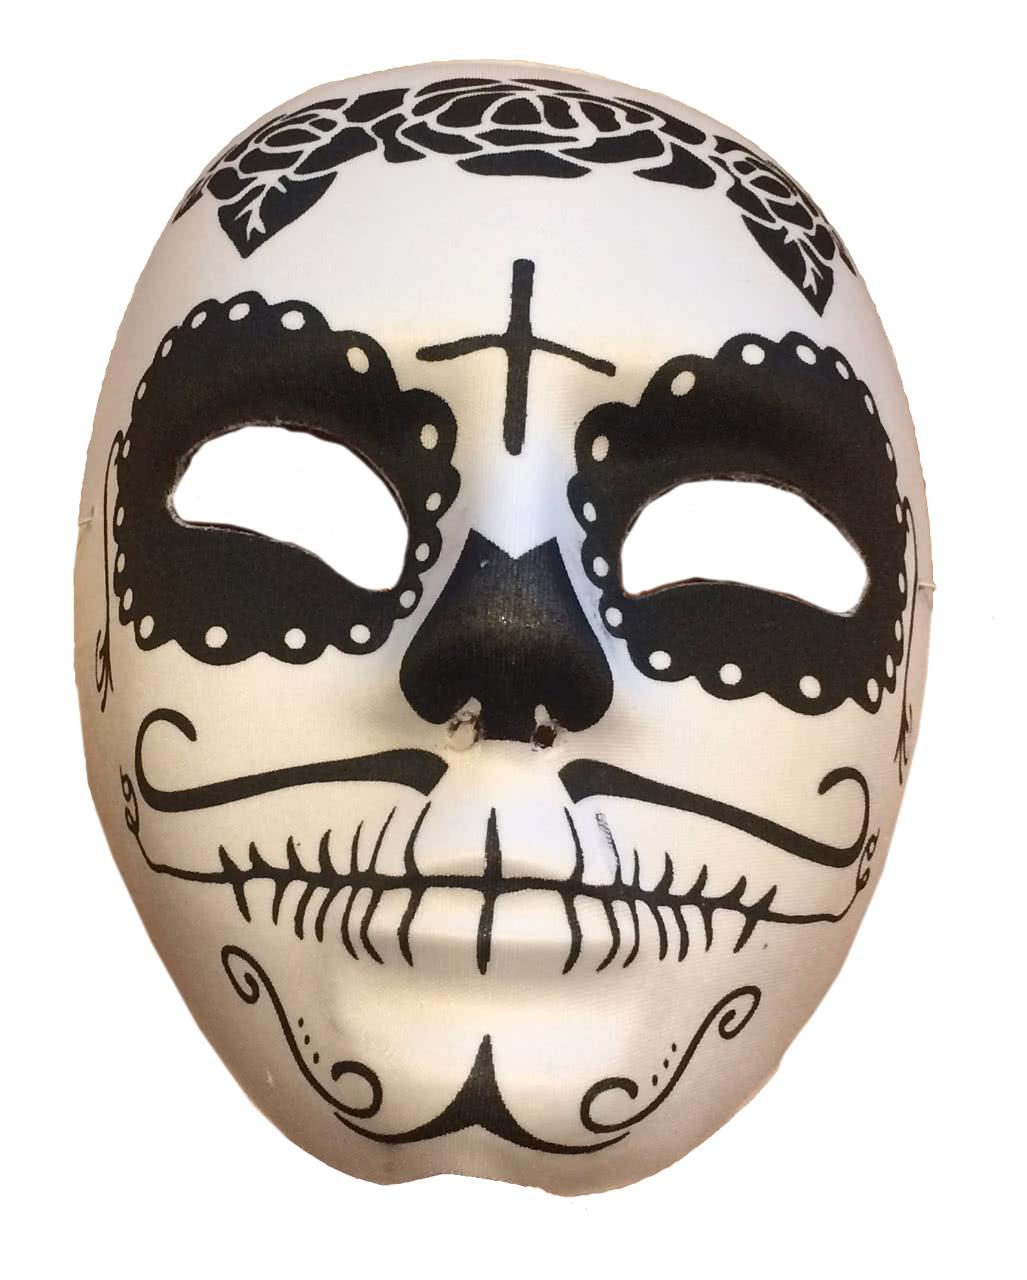 Sugar Skull Mask Black / White Day of the Dead mask   horror-shop.com